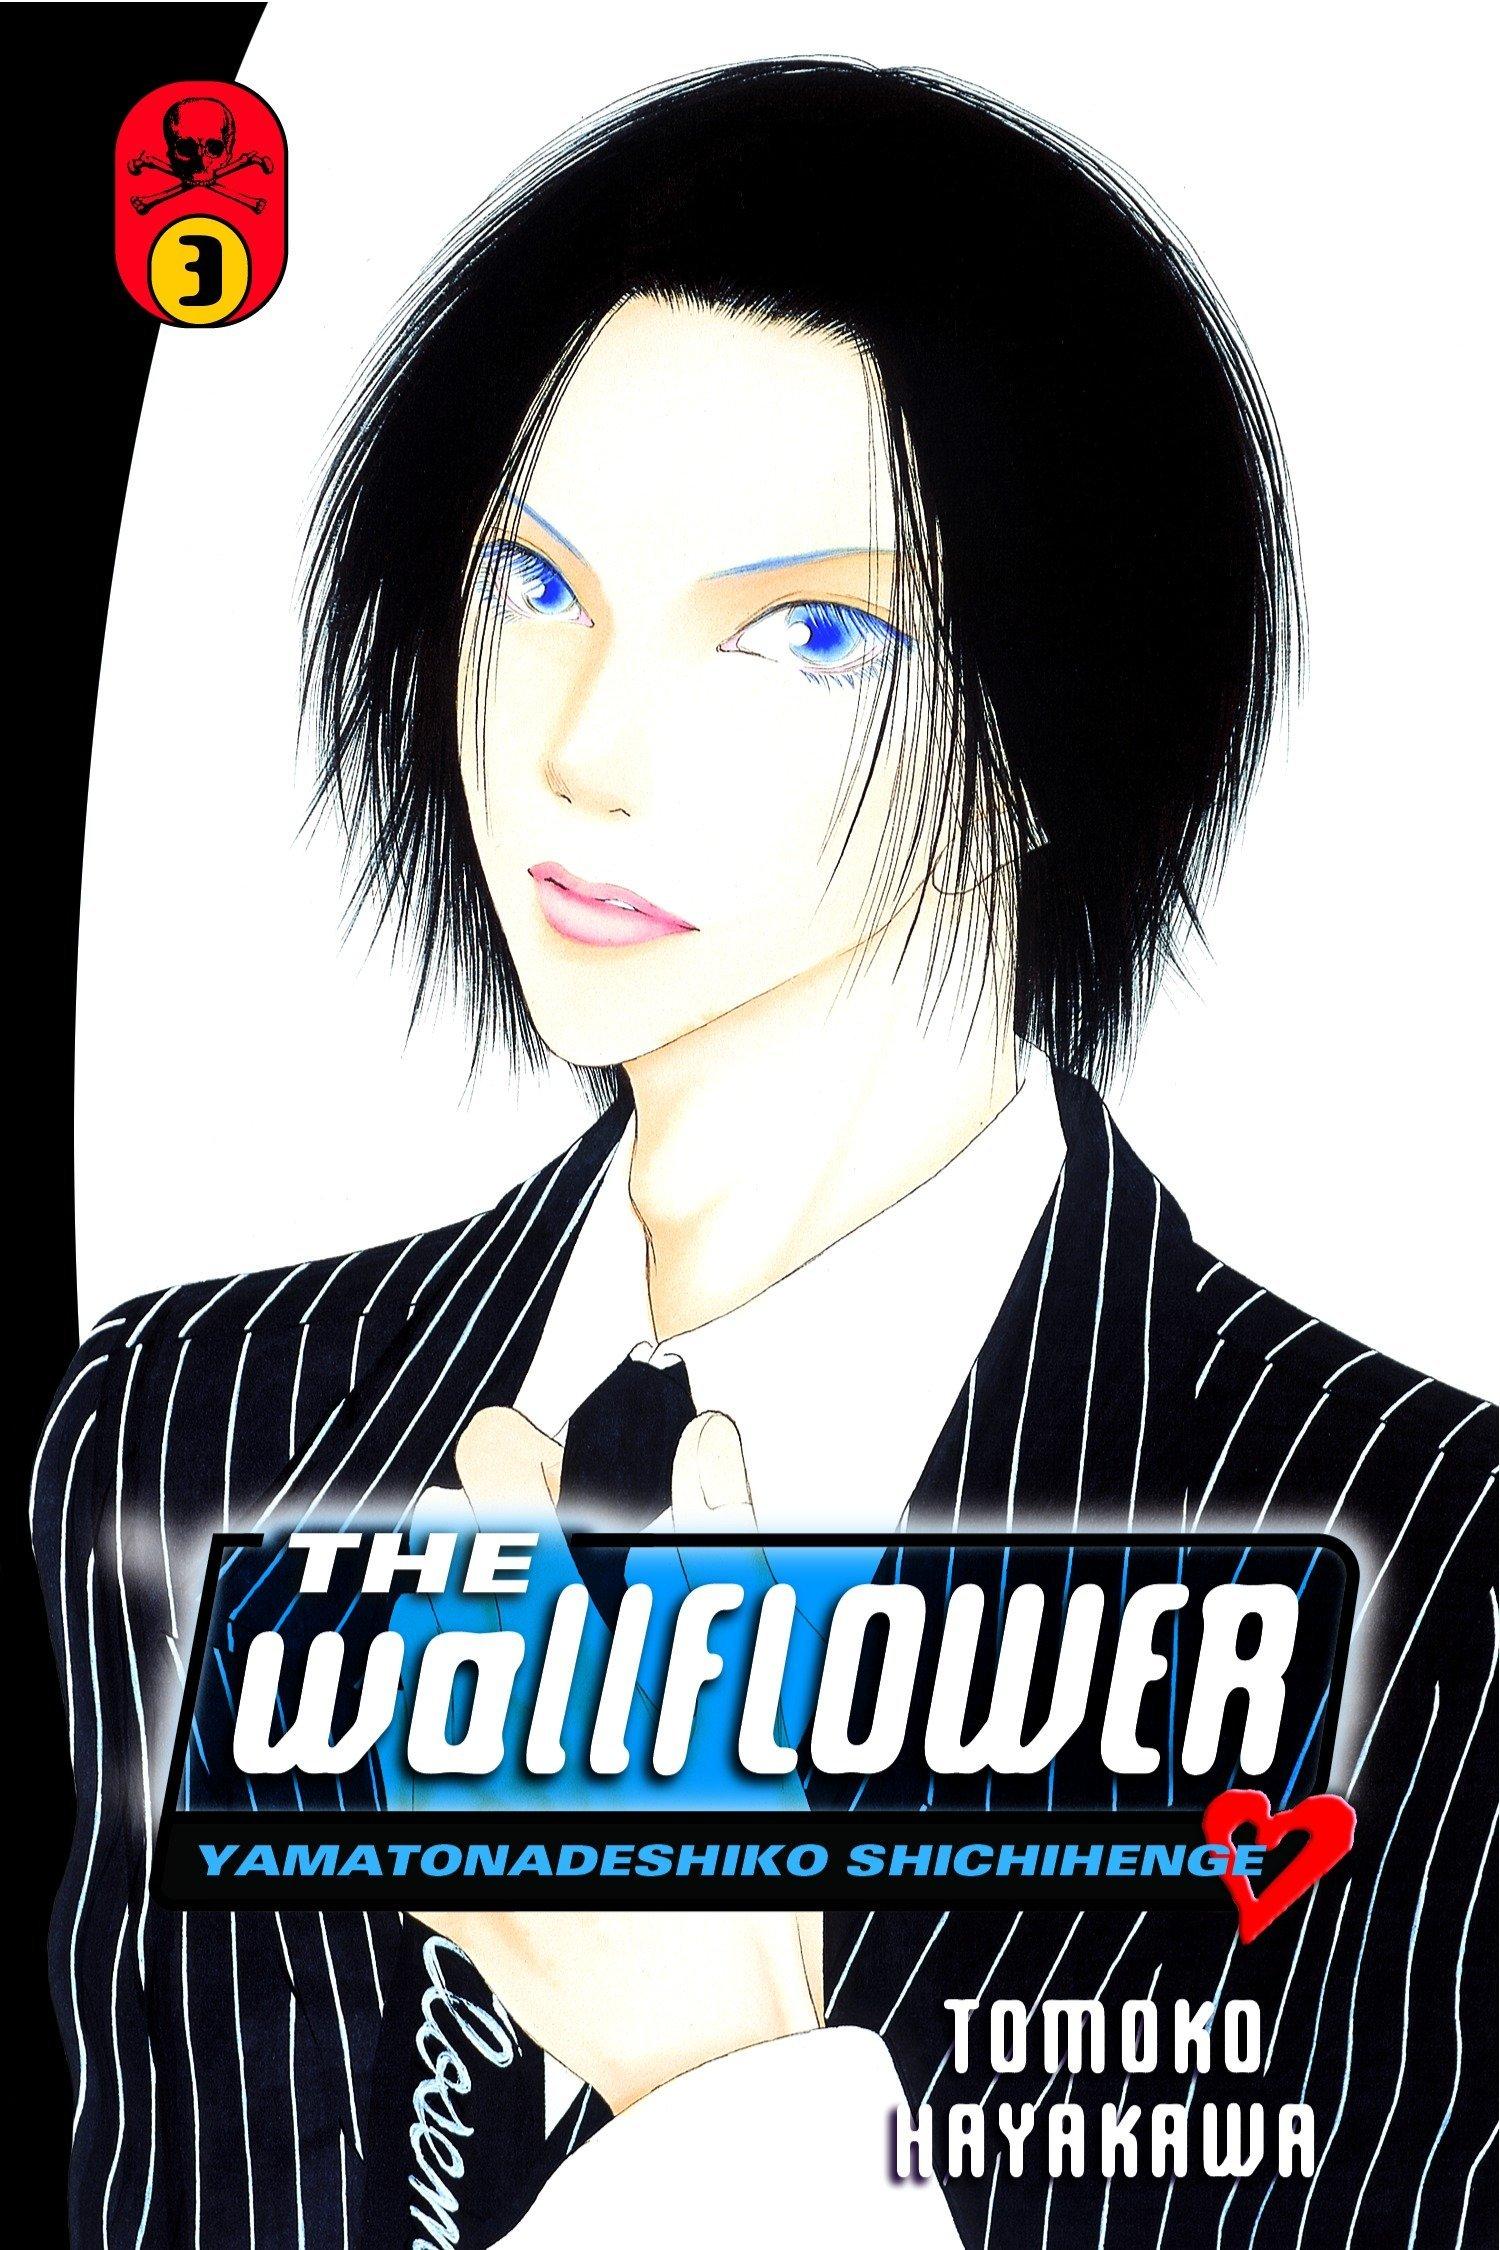 The Wallflower 3 pdf